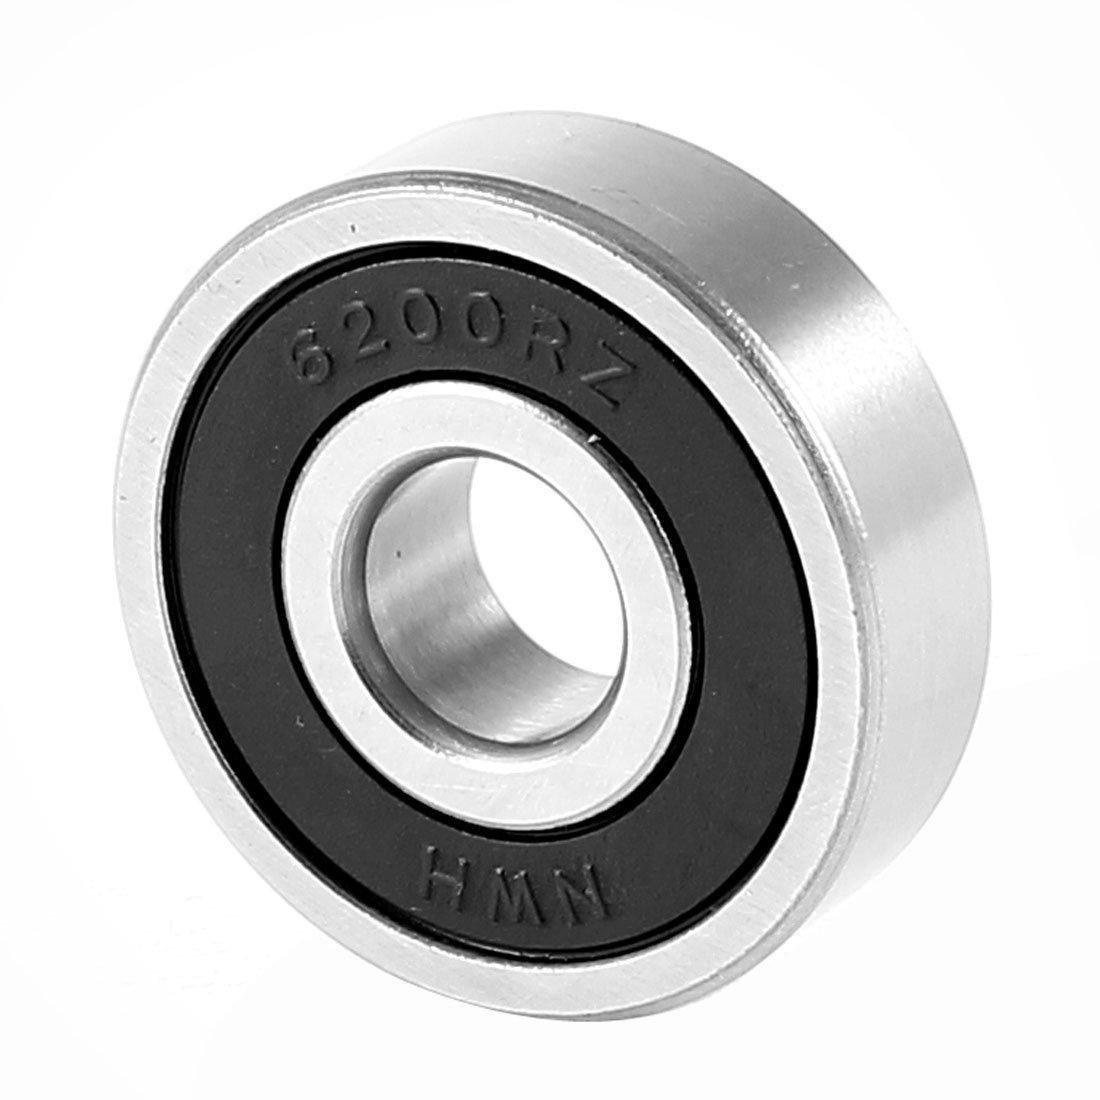 Replacement 6200RZ Deep Groove Ball Bearing 30x10x9mm